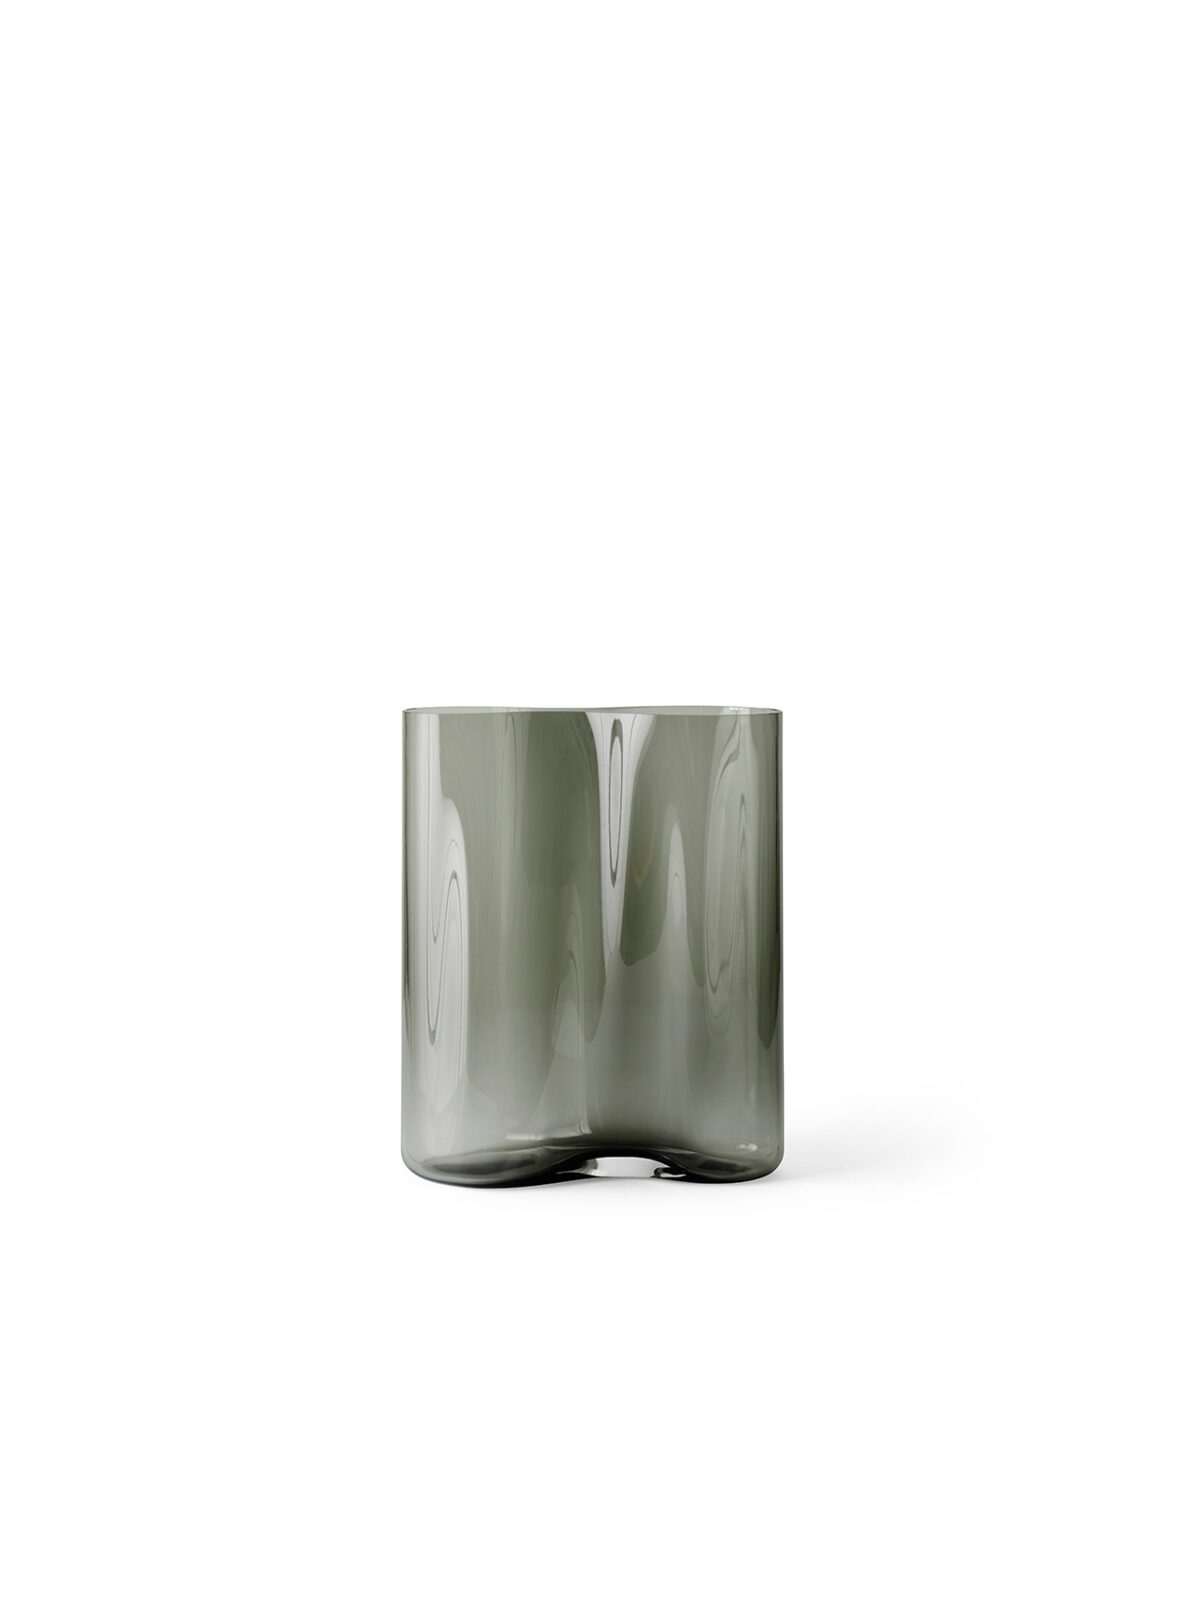 4736949 Aer Vase Small 33 01 1 1